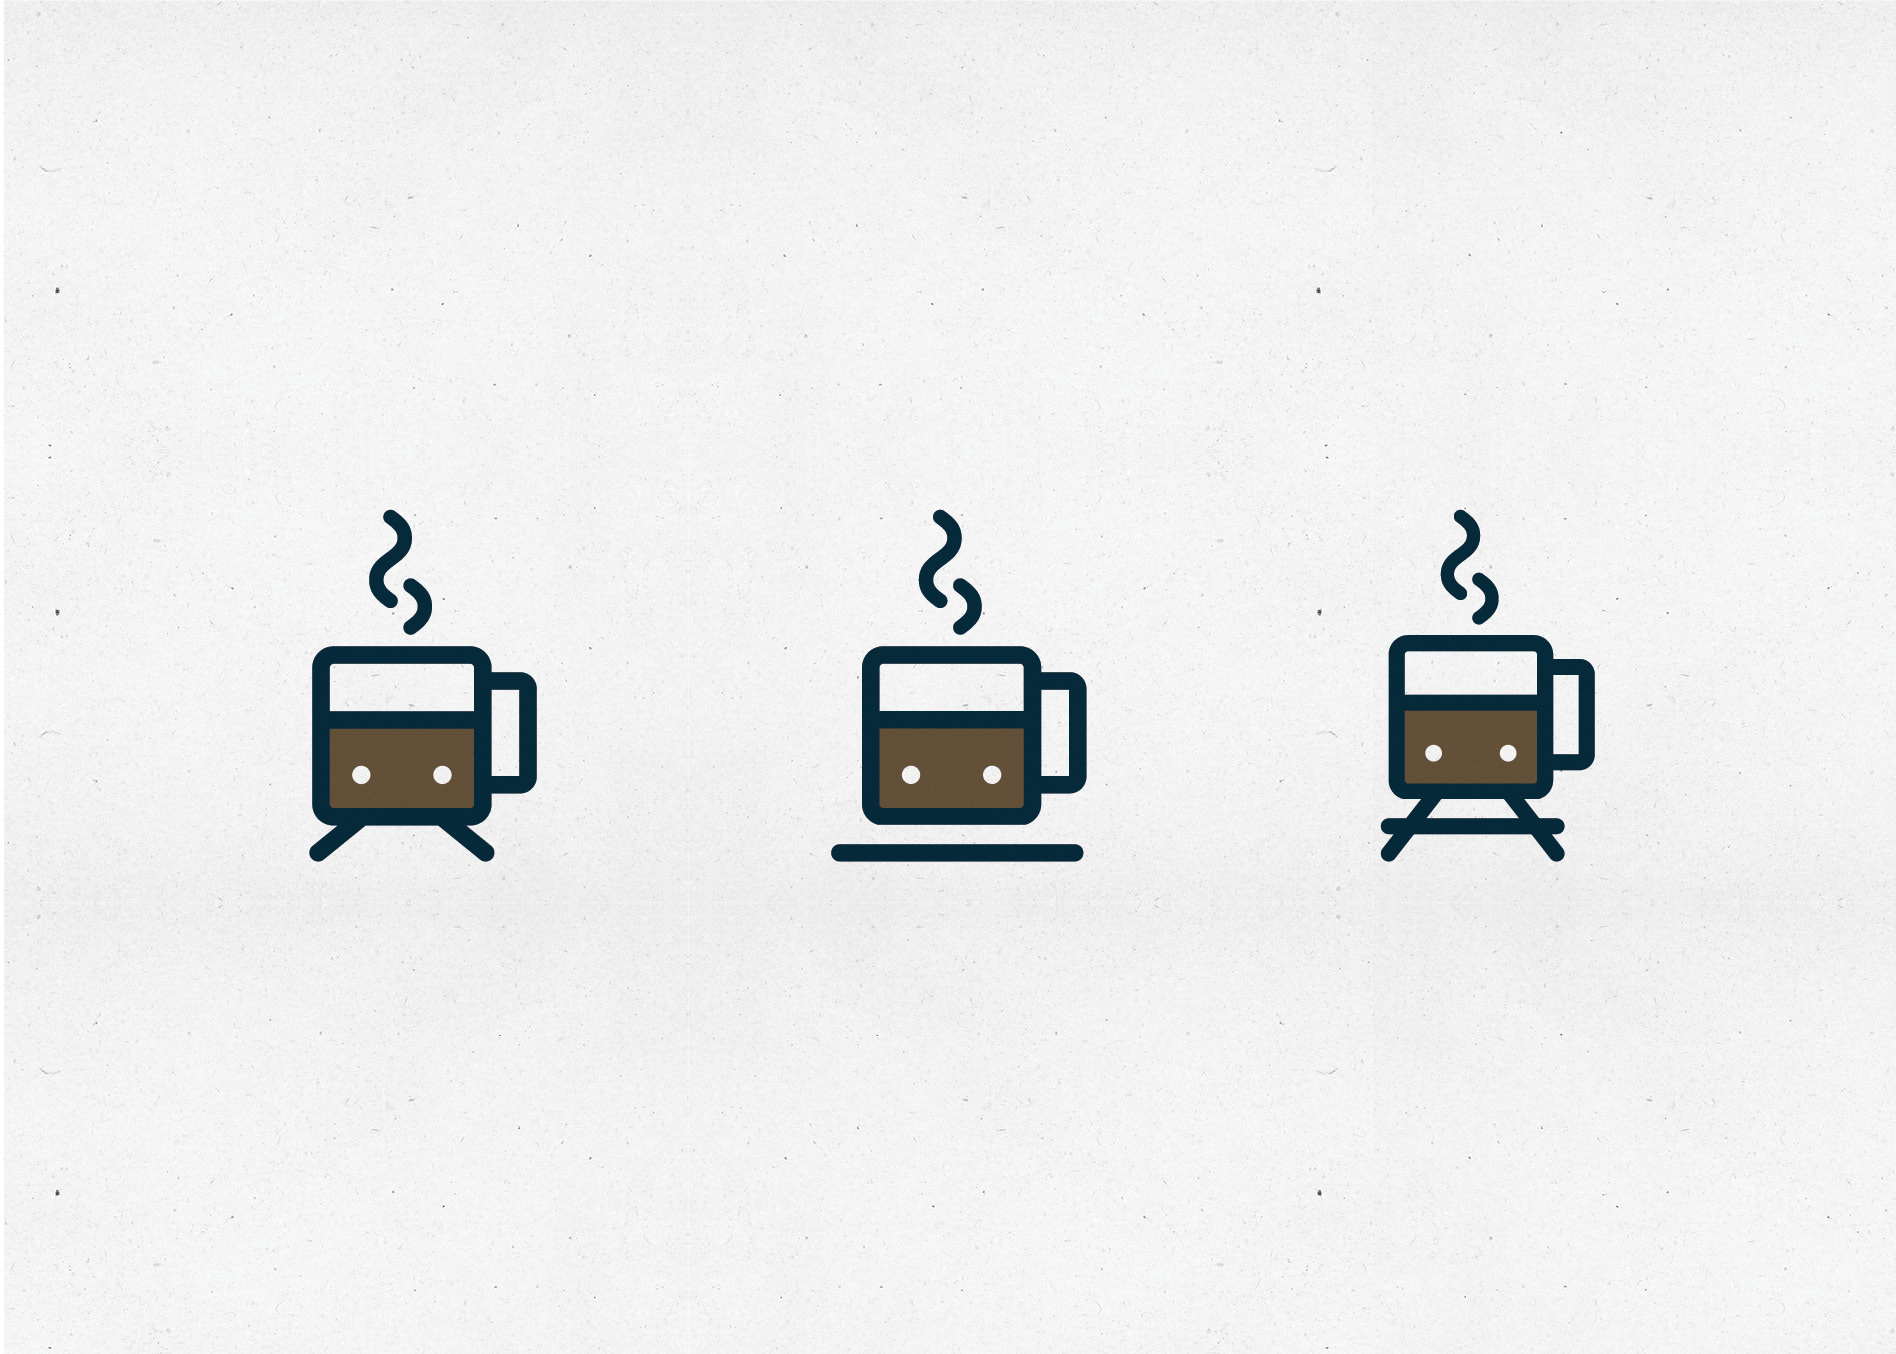 coffee shop logo design icons